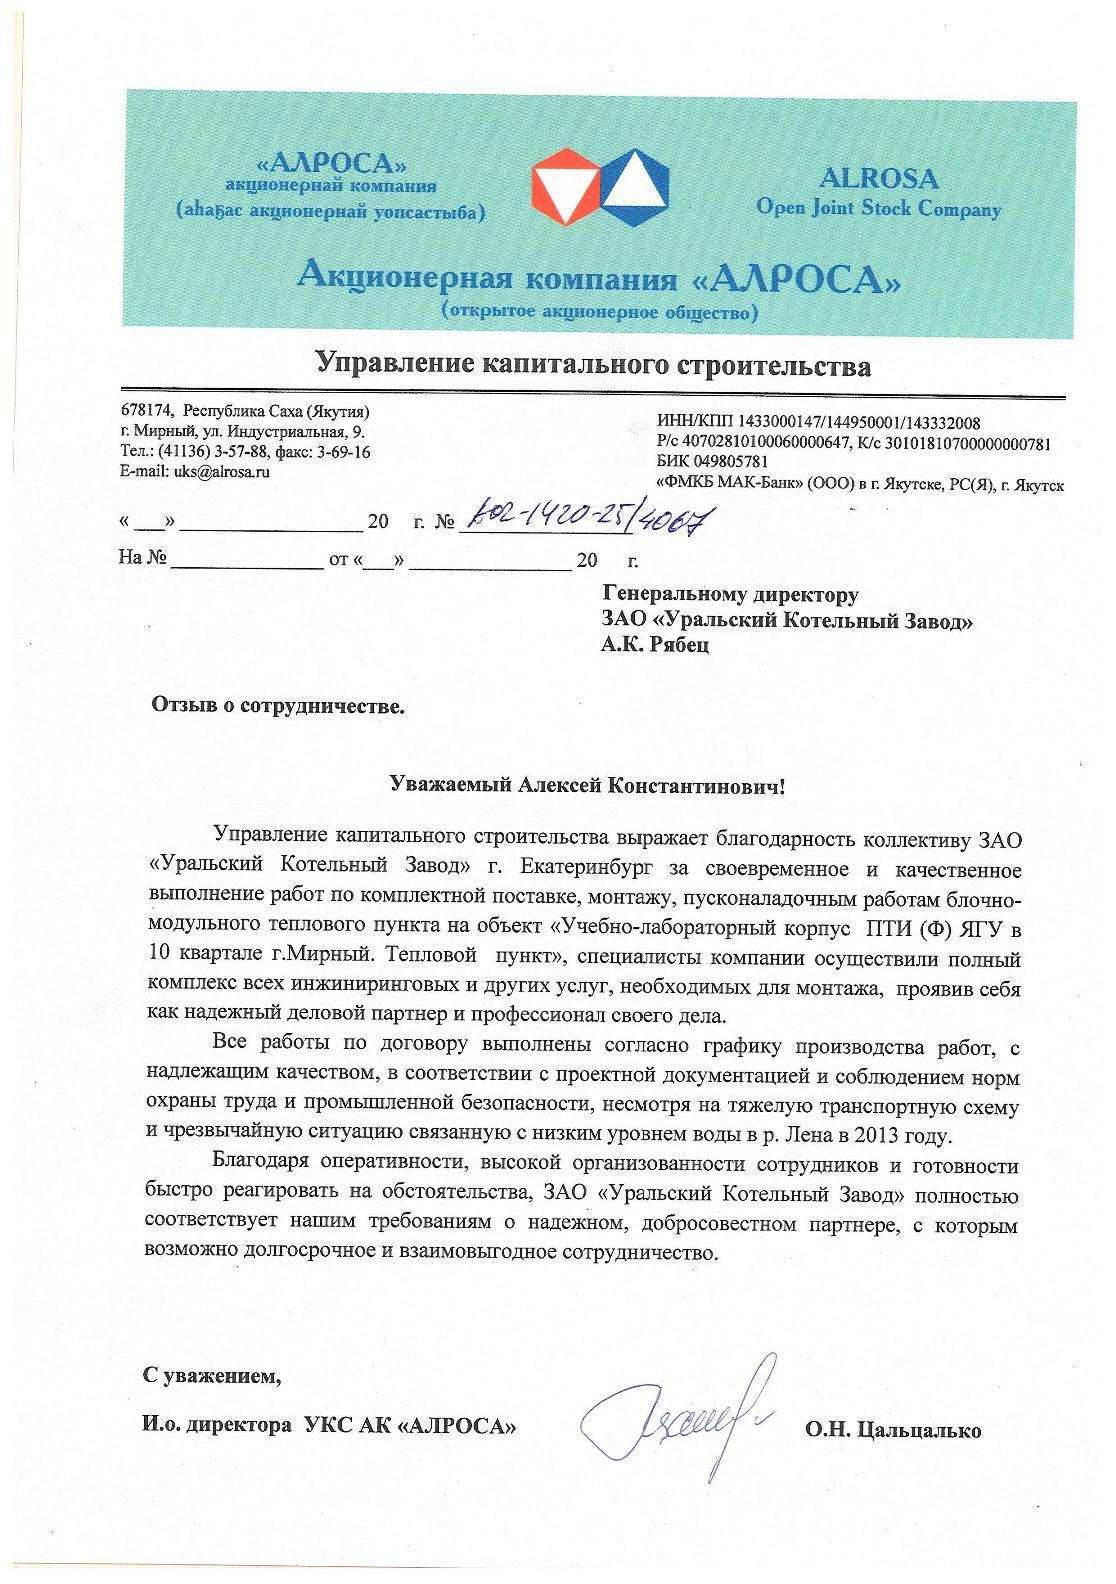 otzyv_2013-10-00_alrosa_Tsaltsalko